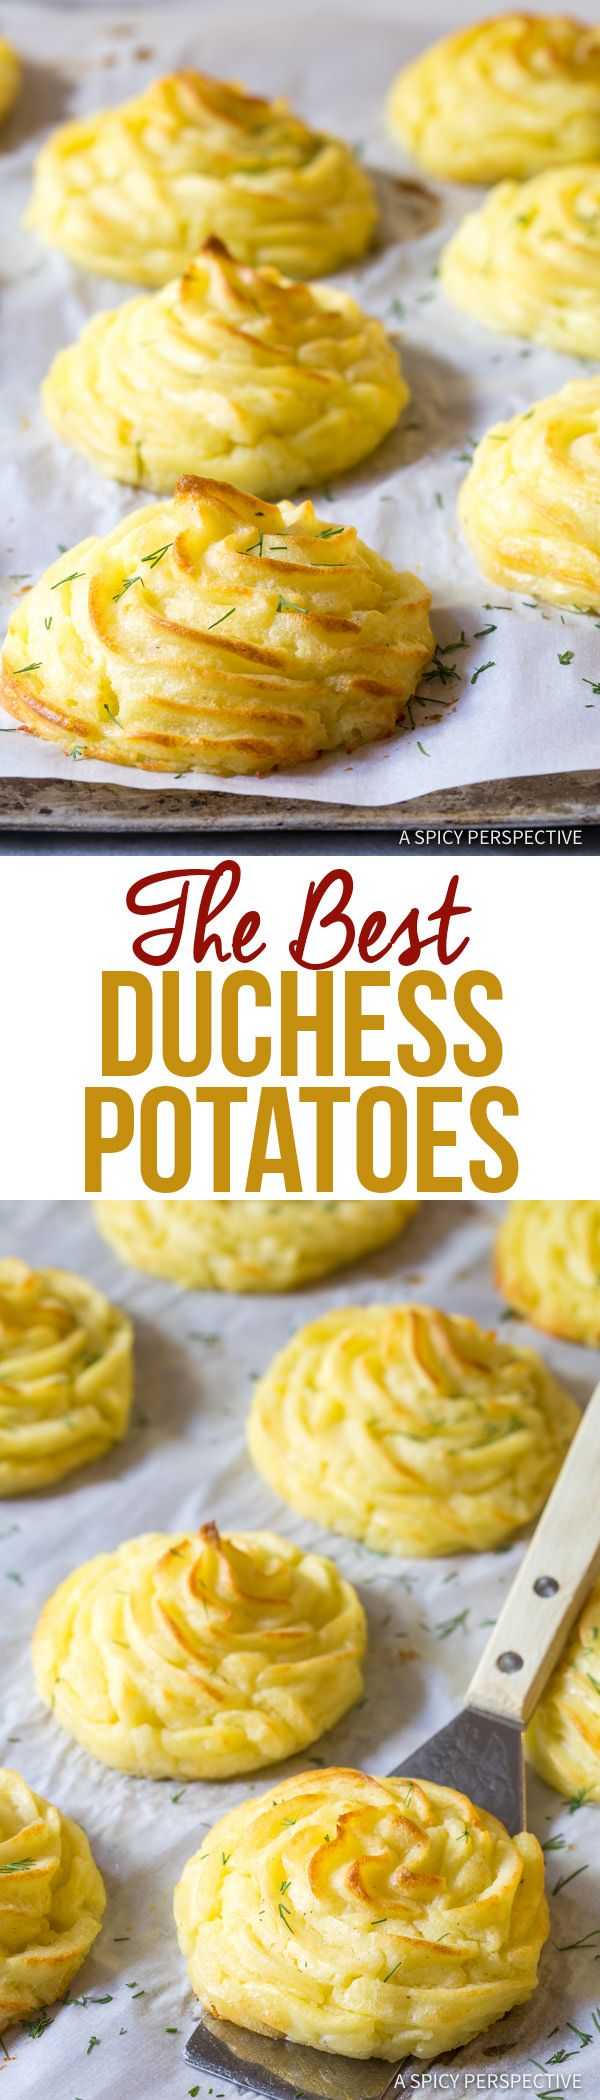 Best Ever Duchess Potatoes Recipe | ASpicyPerspective.com